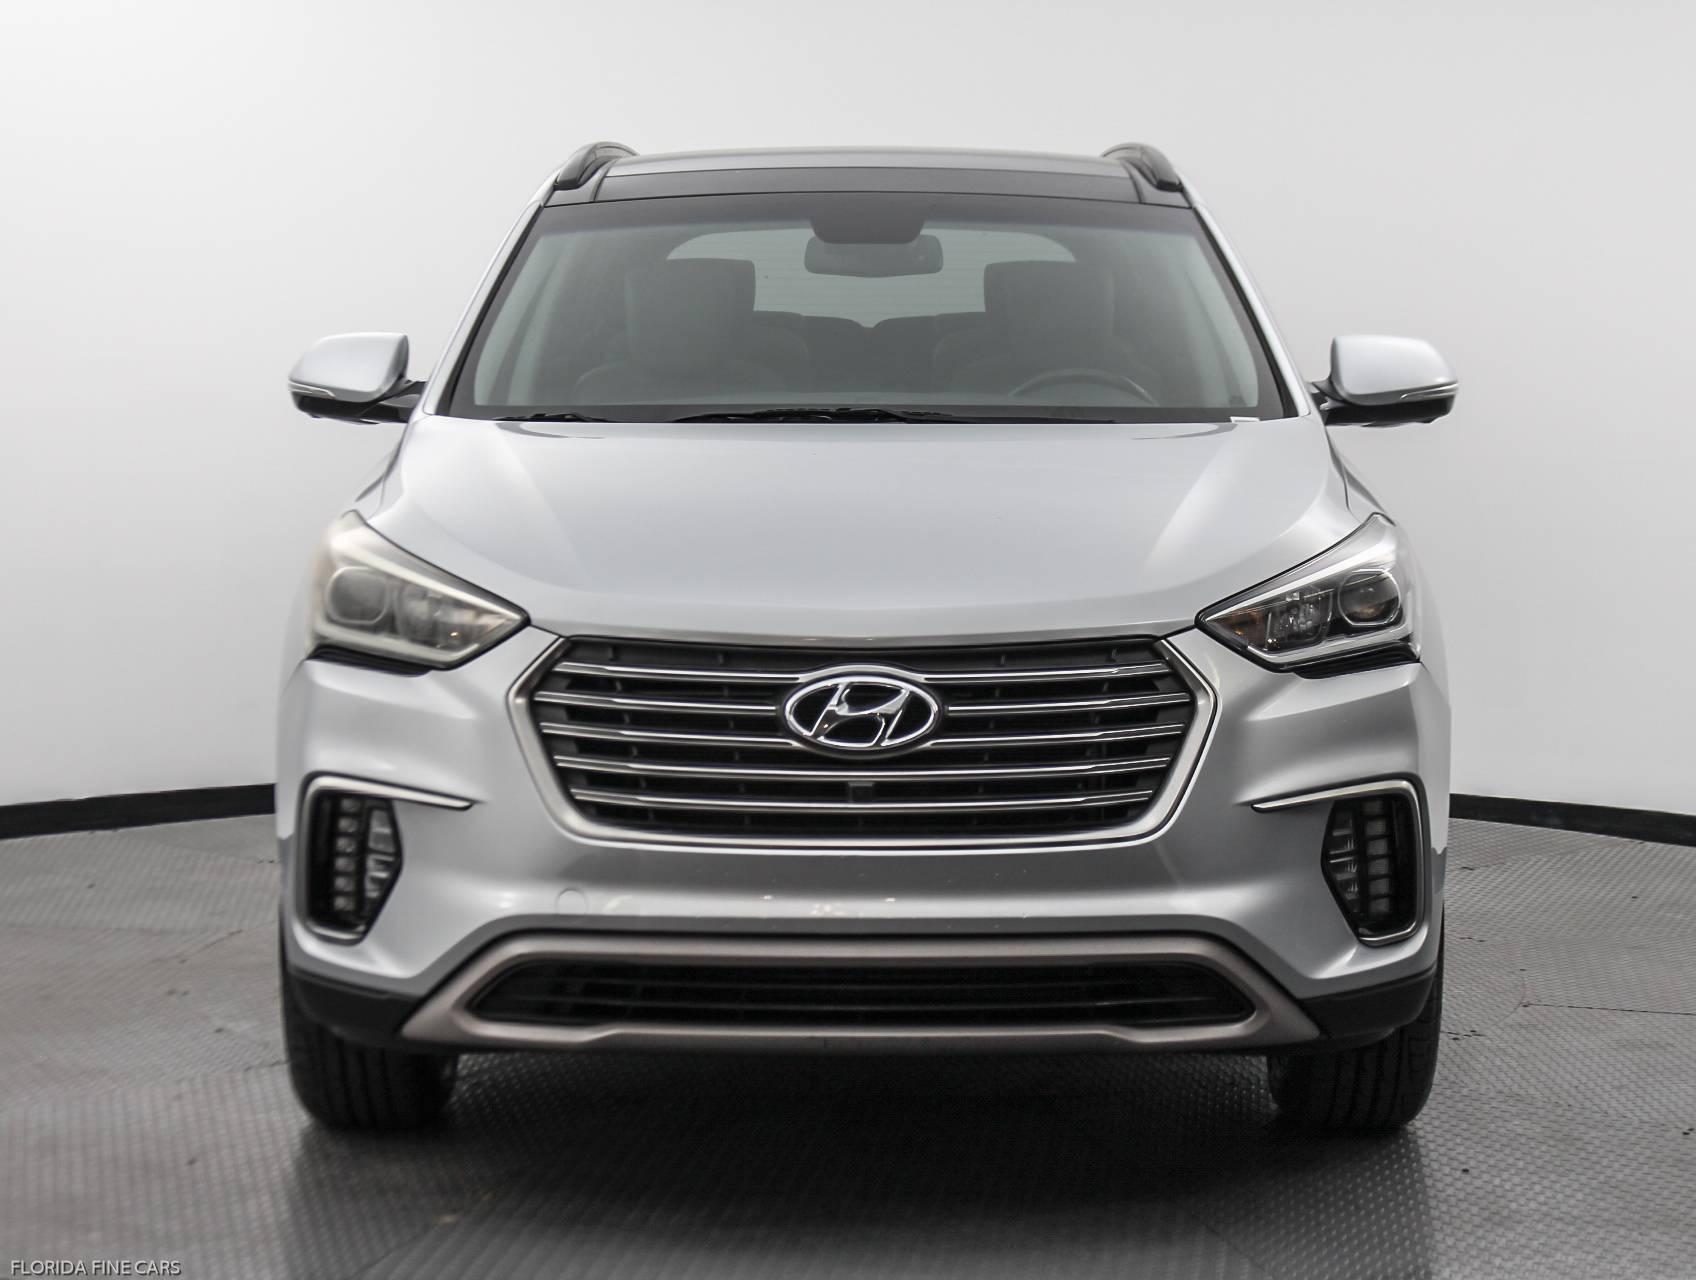 Florida Fine Cars - Used vehicle - SUV HYUNDAI SANTA FE 2017